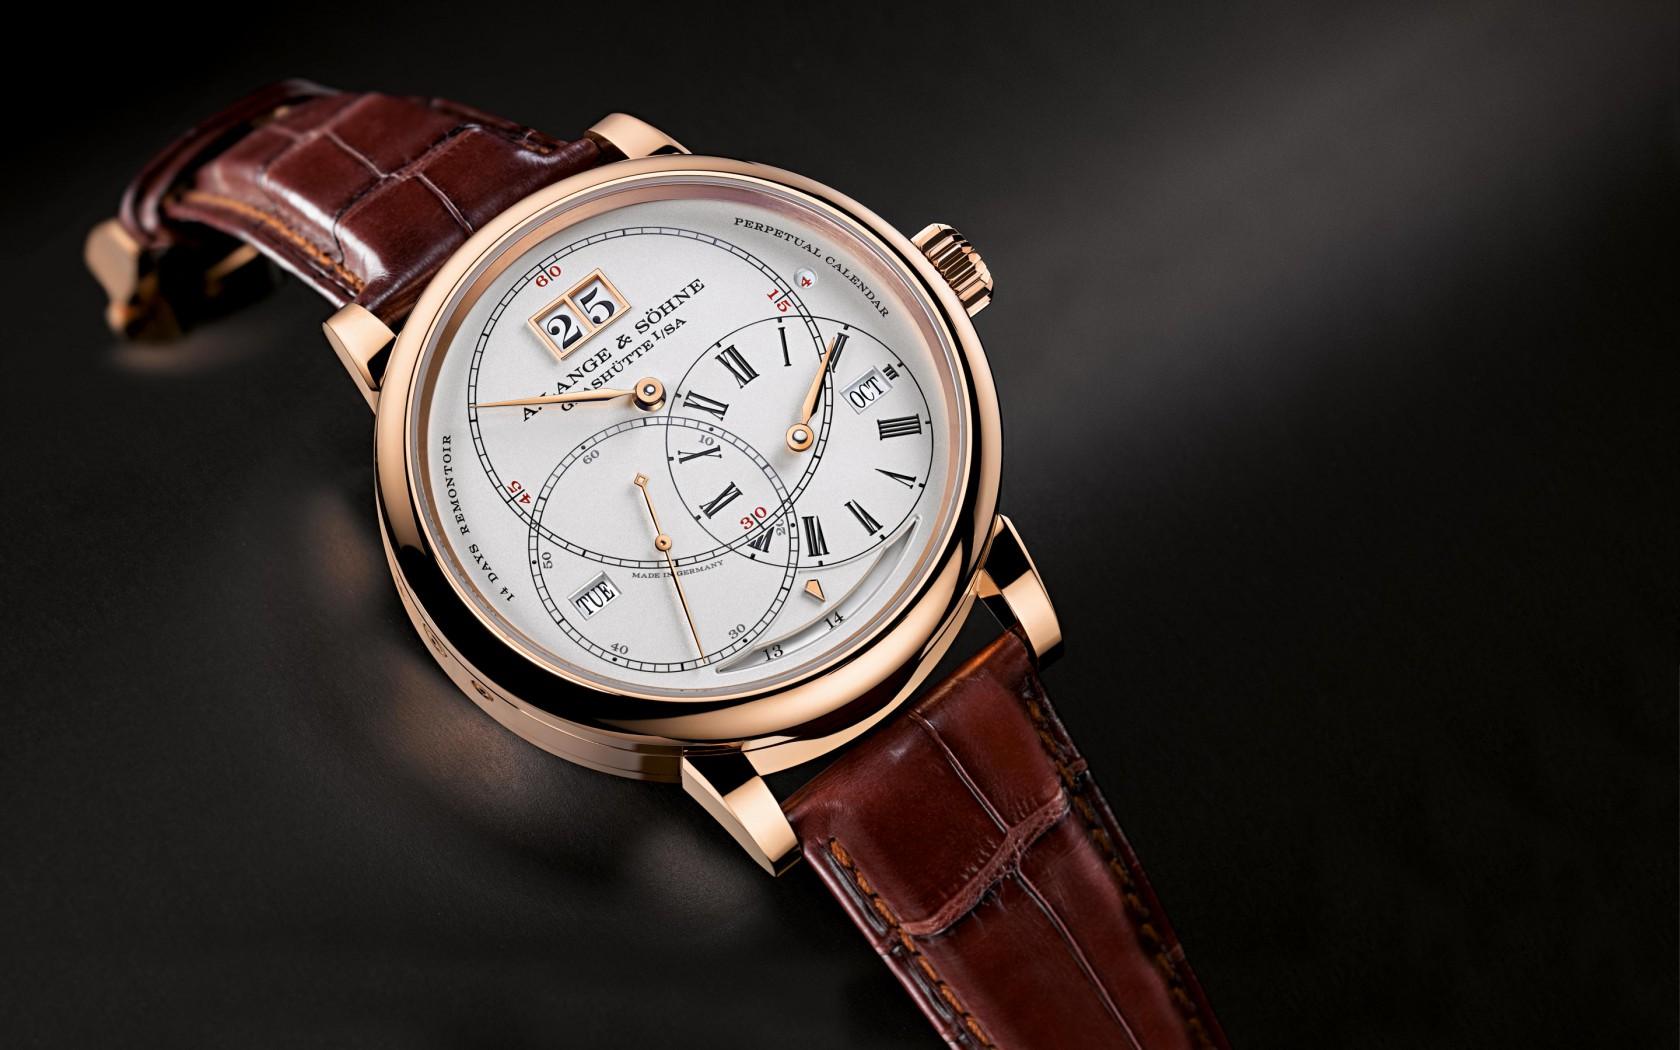 SetWidth1680-Lange-Richard-Lange-Ewiger-Kalender-Terraluna-Perpetual-Calendar-Rotgold-pink-gold-180032-B1